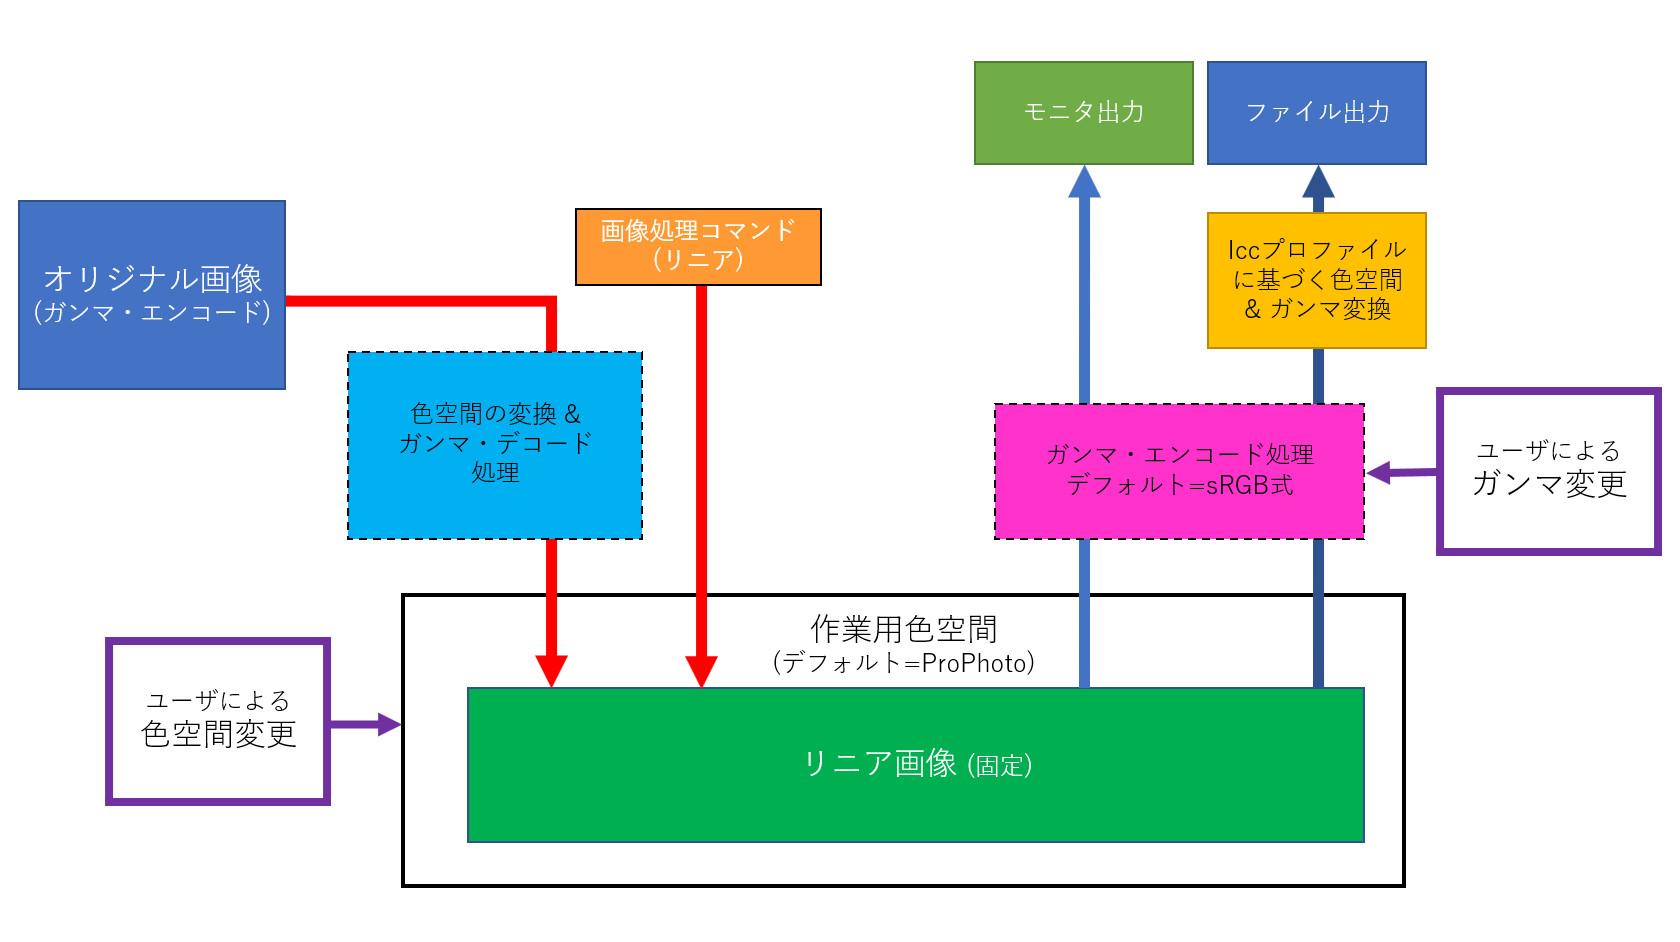 f:id:yasuo_ssi:20201129172521j:plain